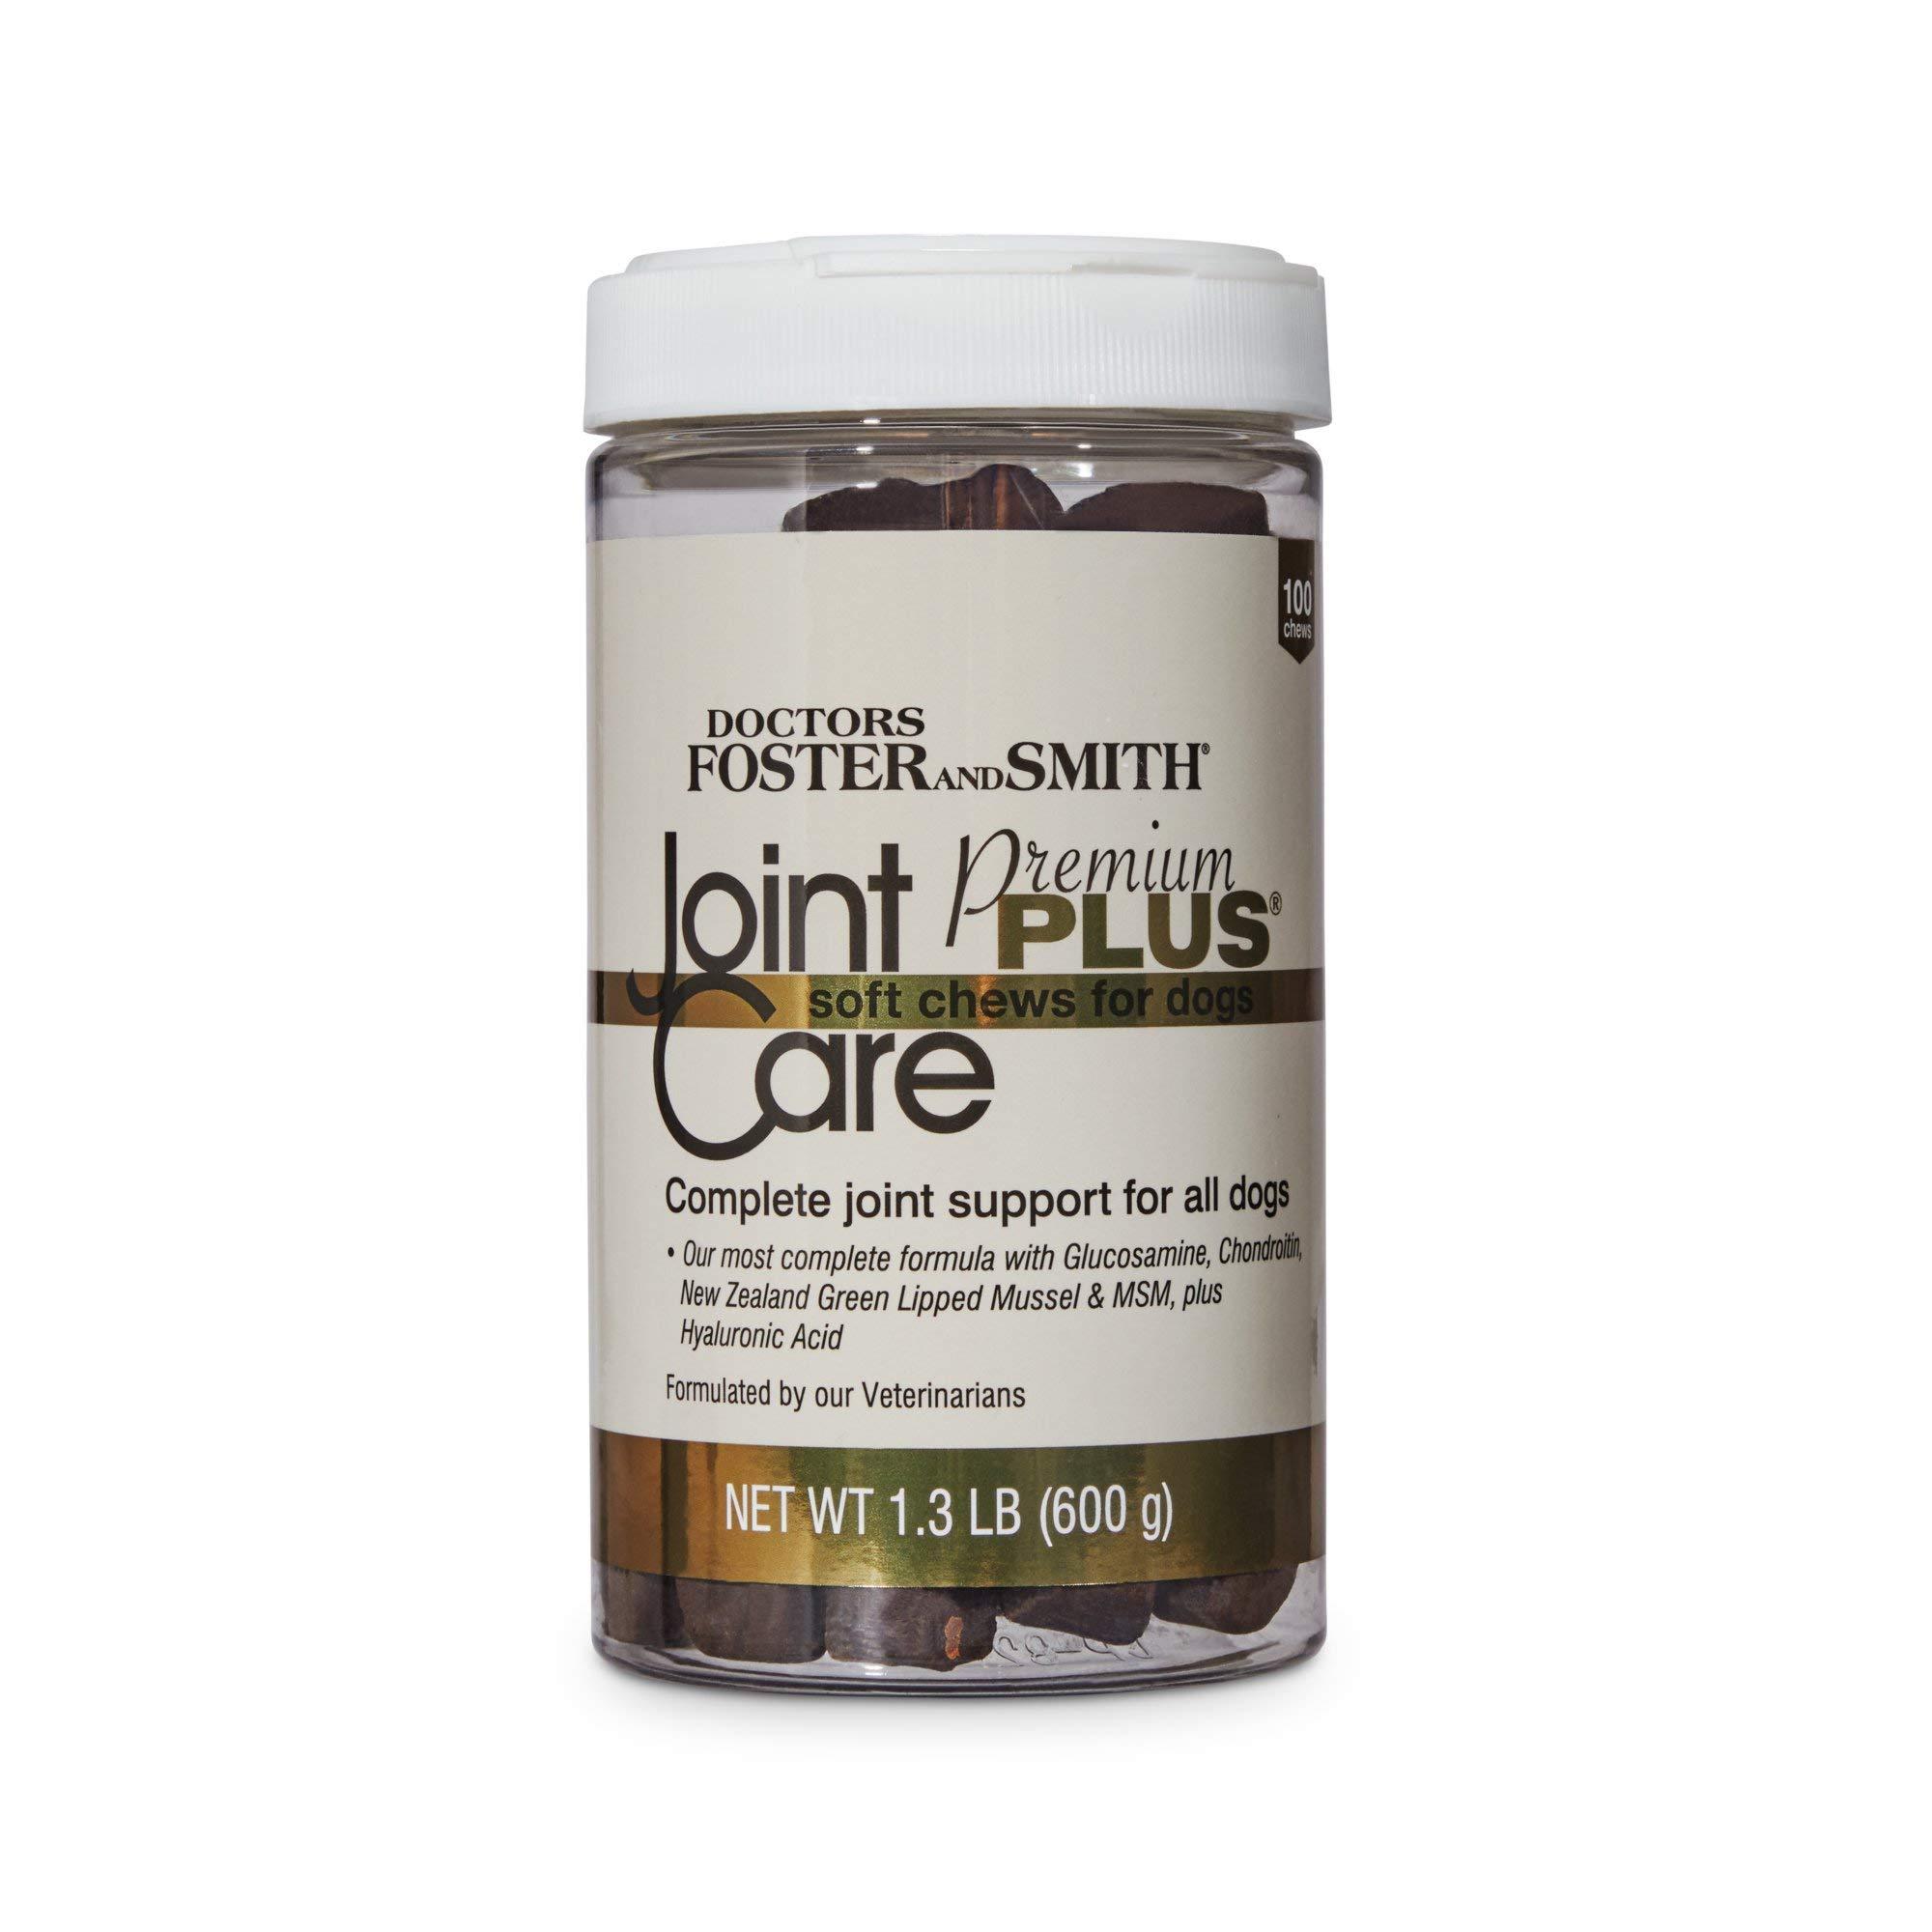 Foster Smith Premium Joint Chews